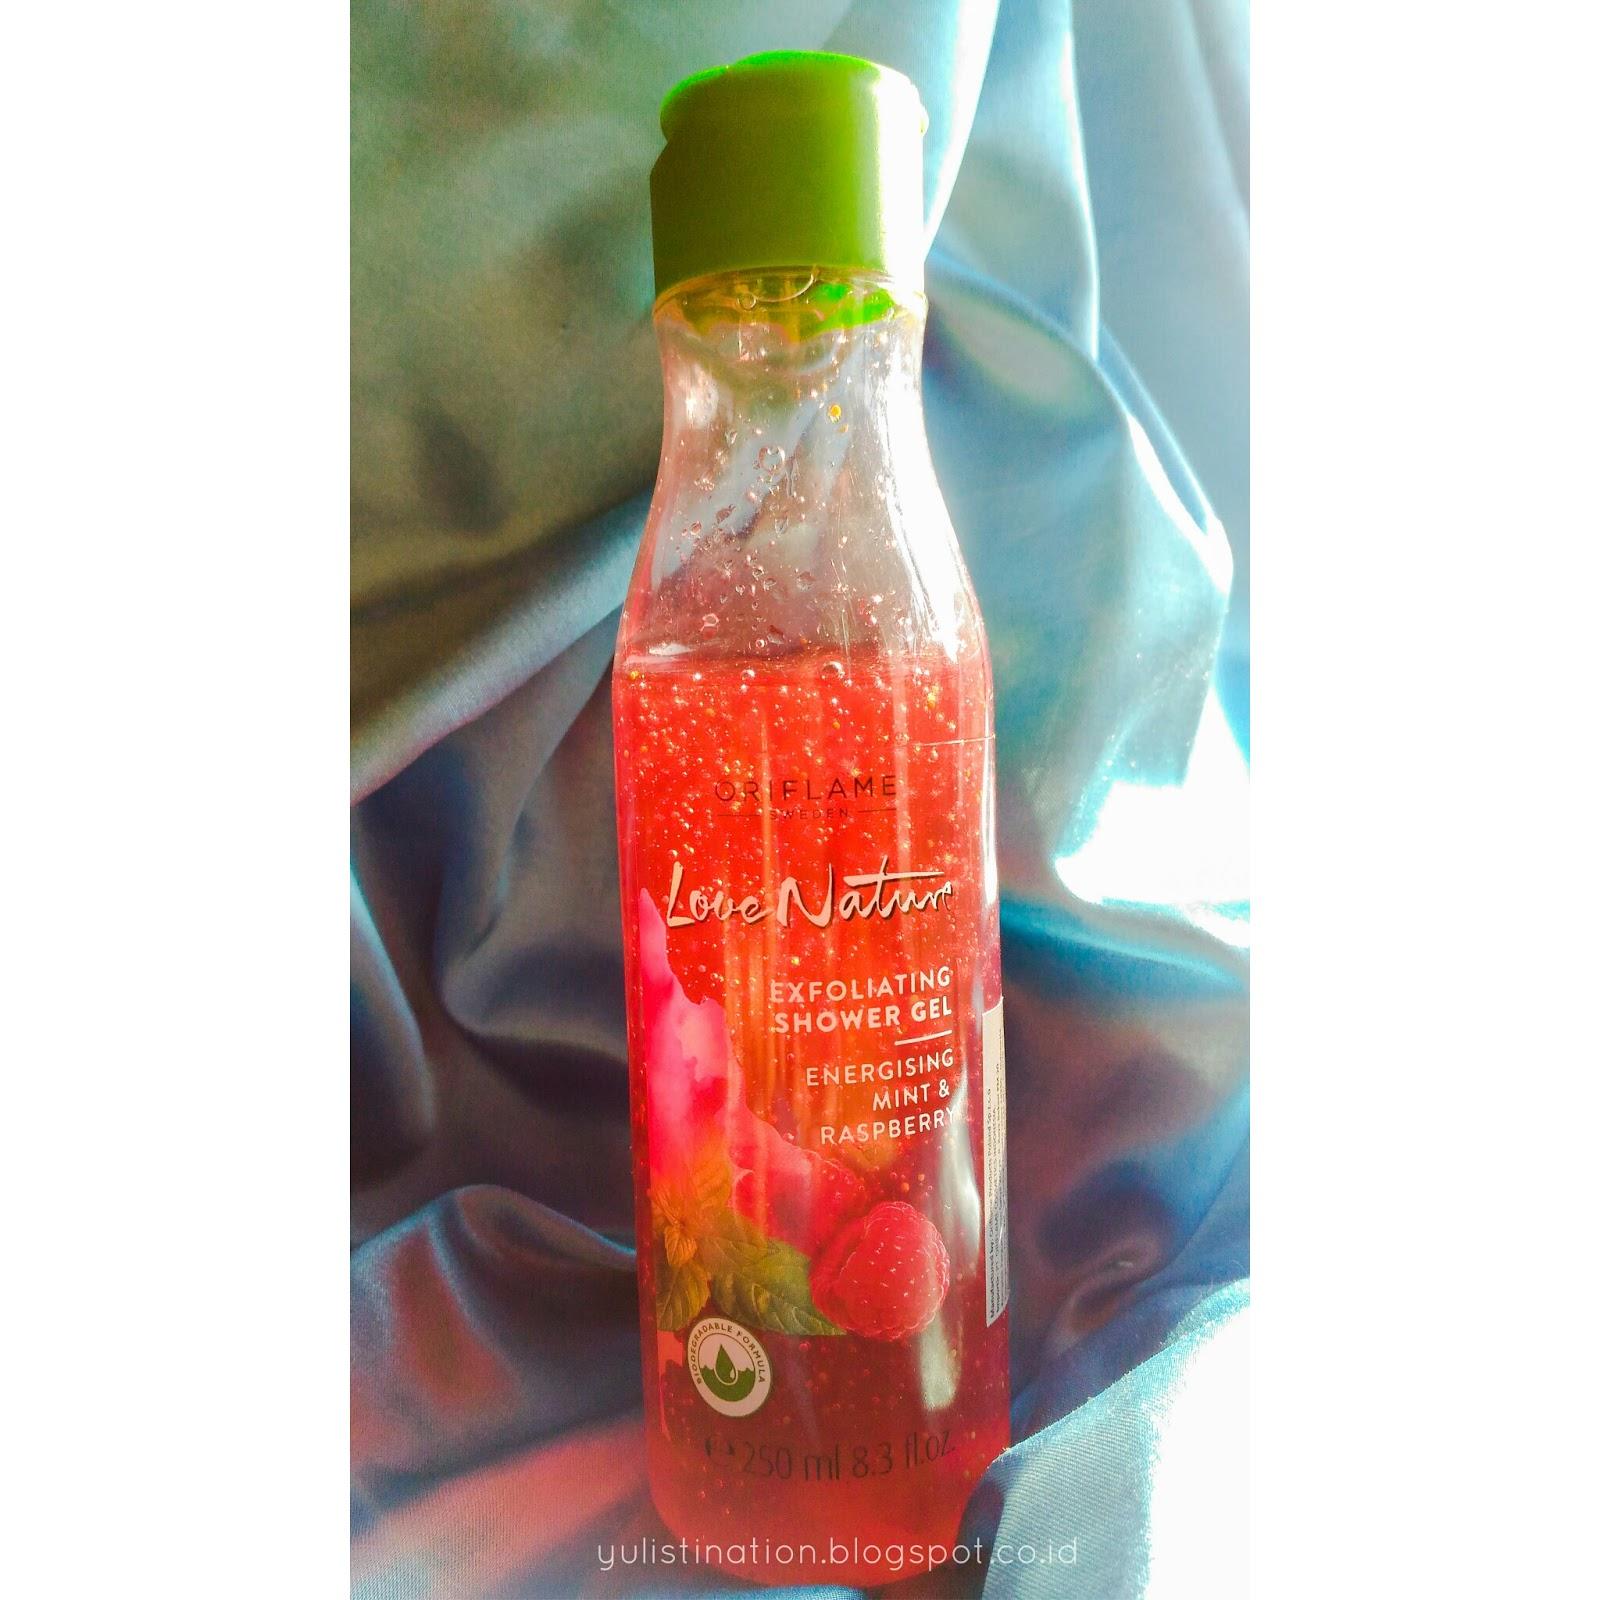 Daftar Harga Wardah Lip Balm Strawberry 65 G Termurah 2018 Real Techniques Nicamp039s Picks 5 Sets Review Oriflame Love Nature Exfoliating Shower Gel Energising The Bottle